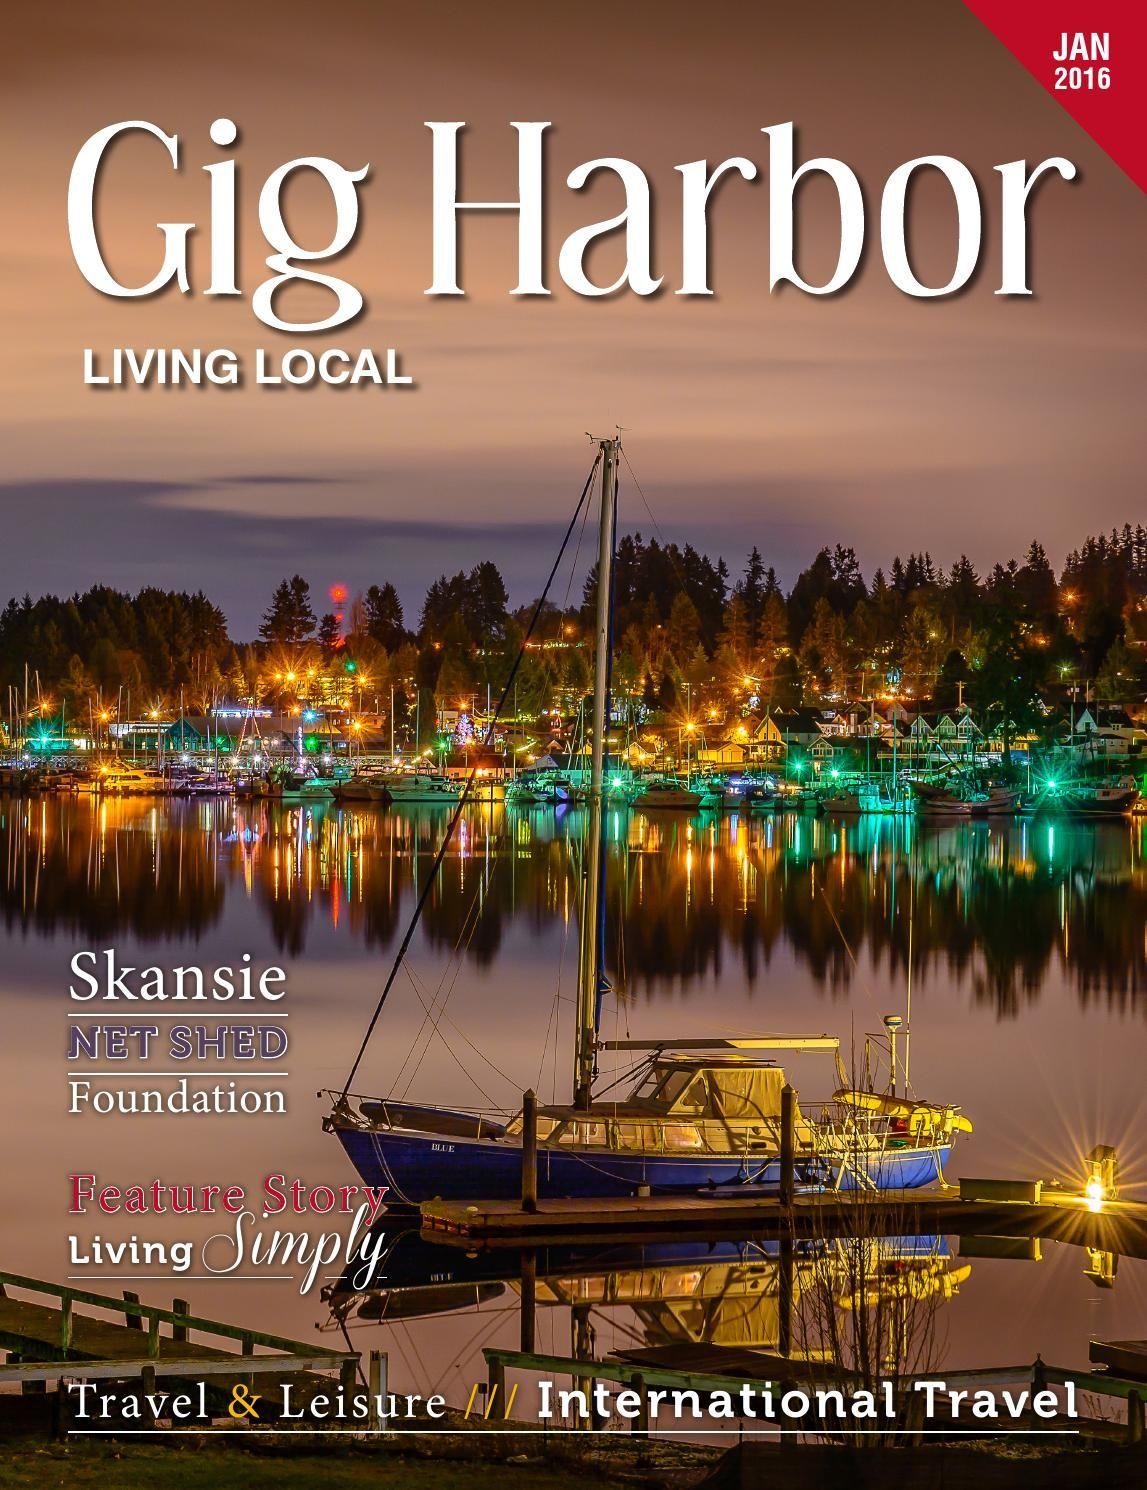 January 2016 Gig Harbor Living Local | Gig Harbor, Washington | Http://